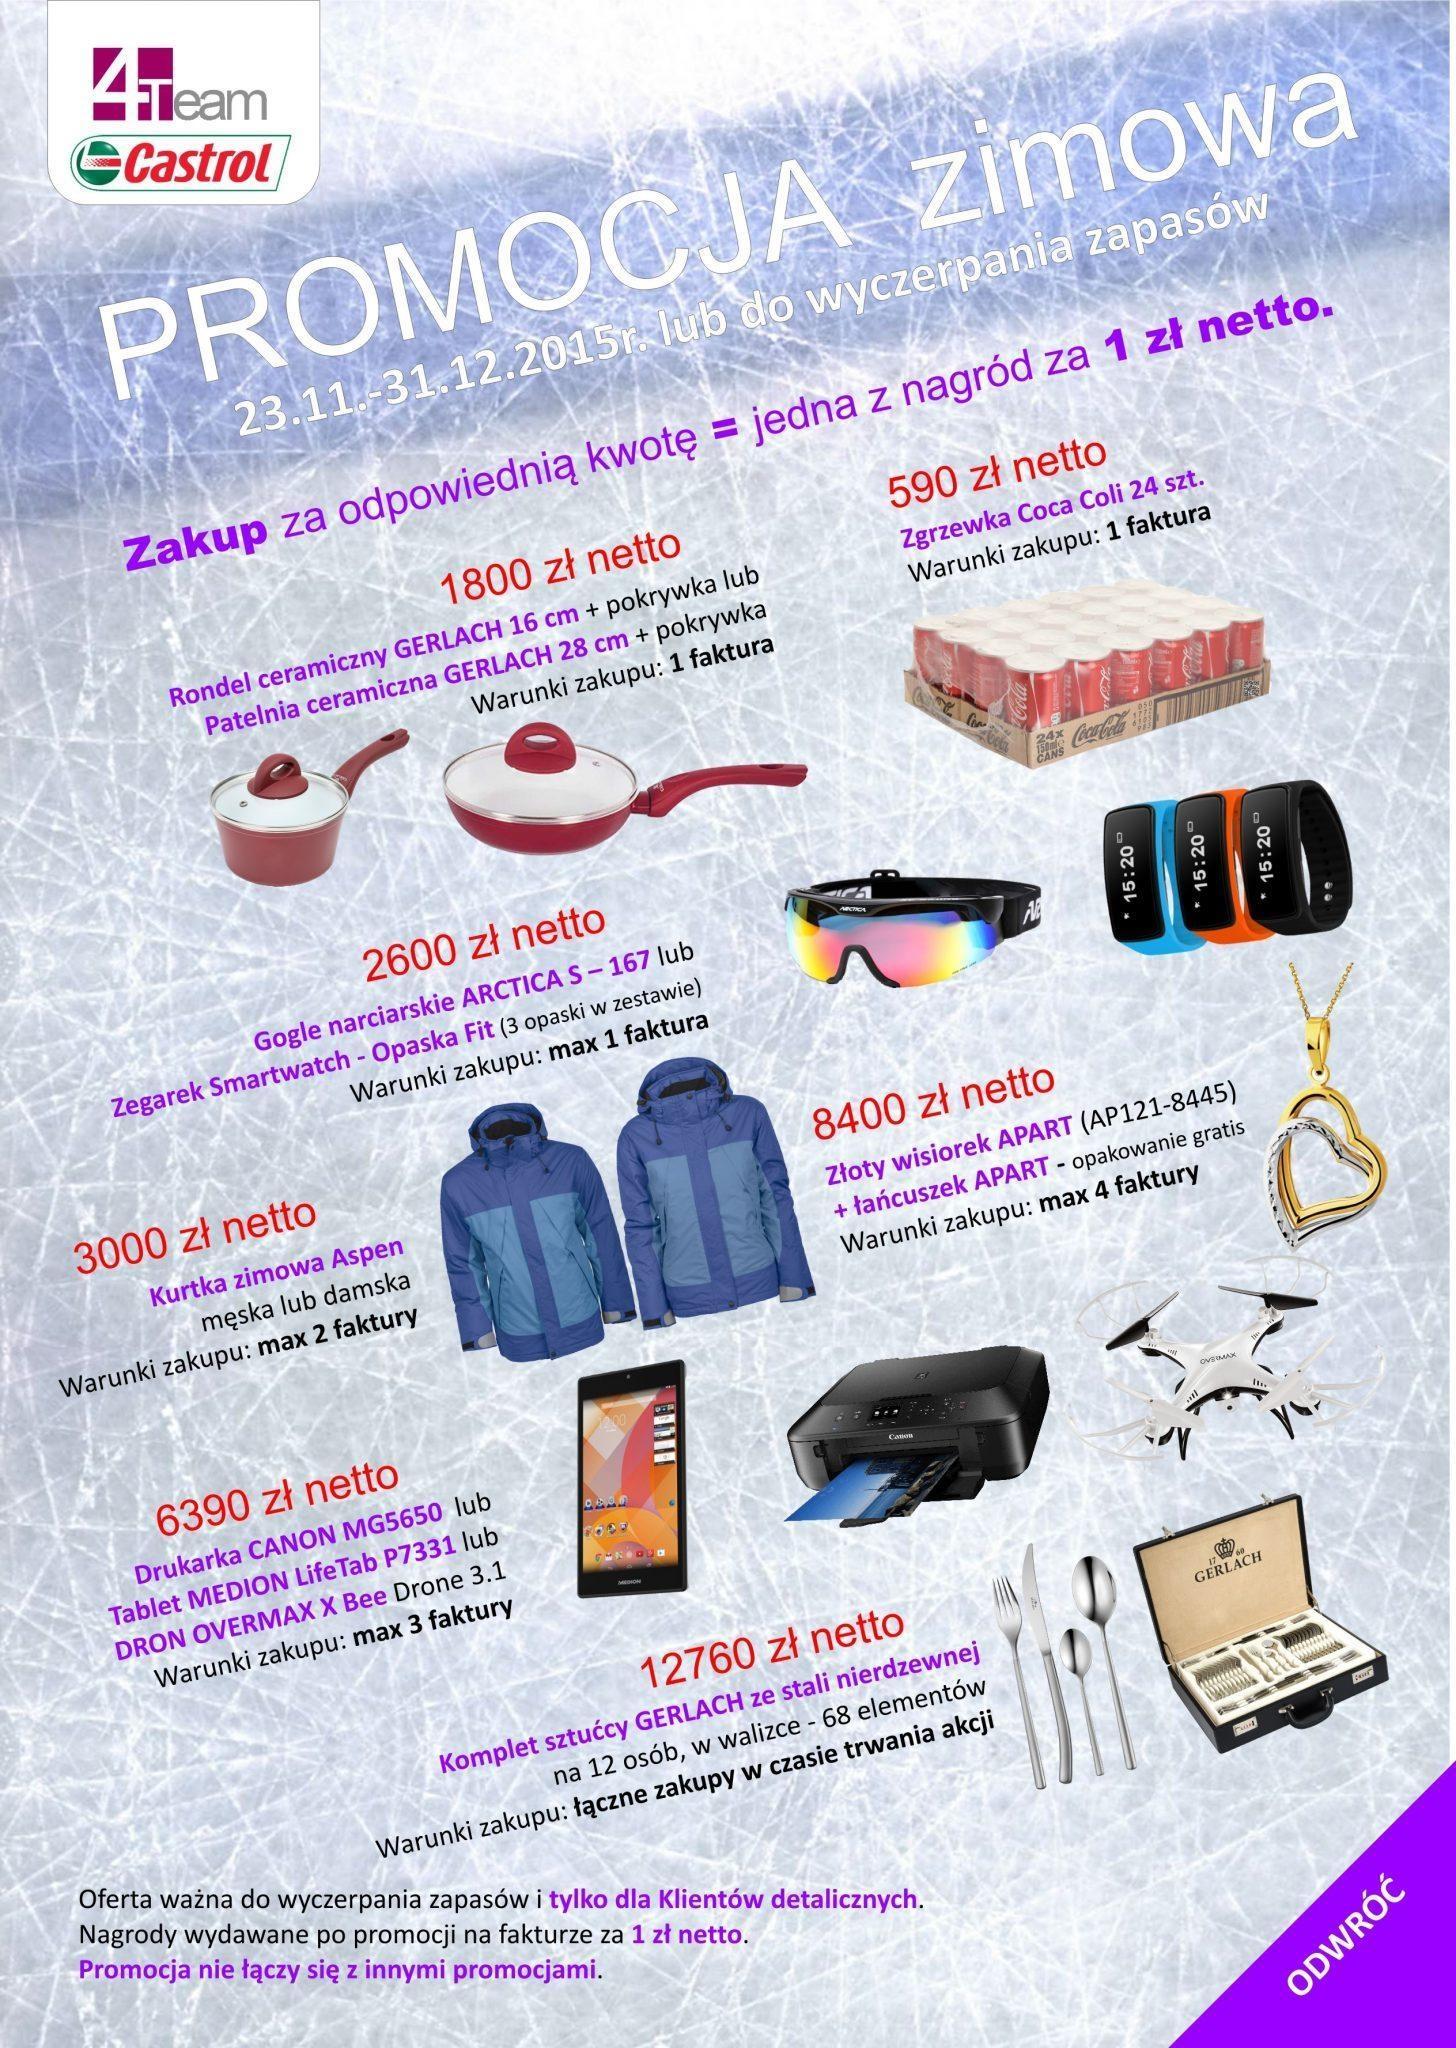 2015 11 27 promocja 4T2 - Promocja zimowa Castrol